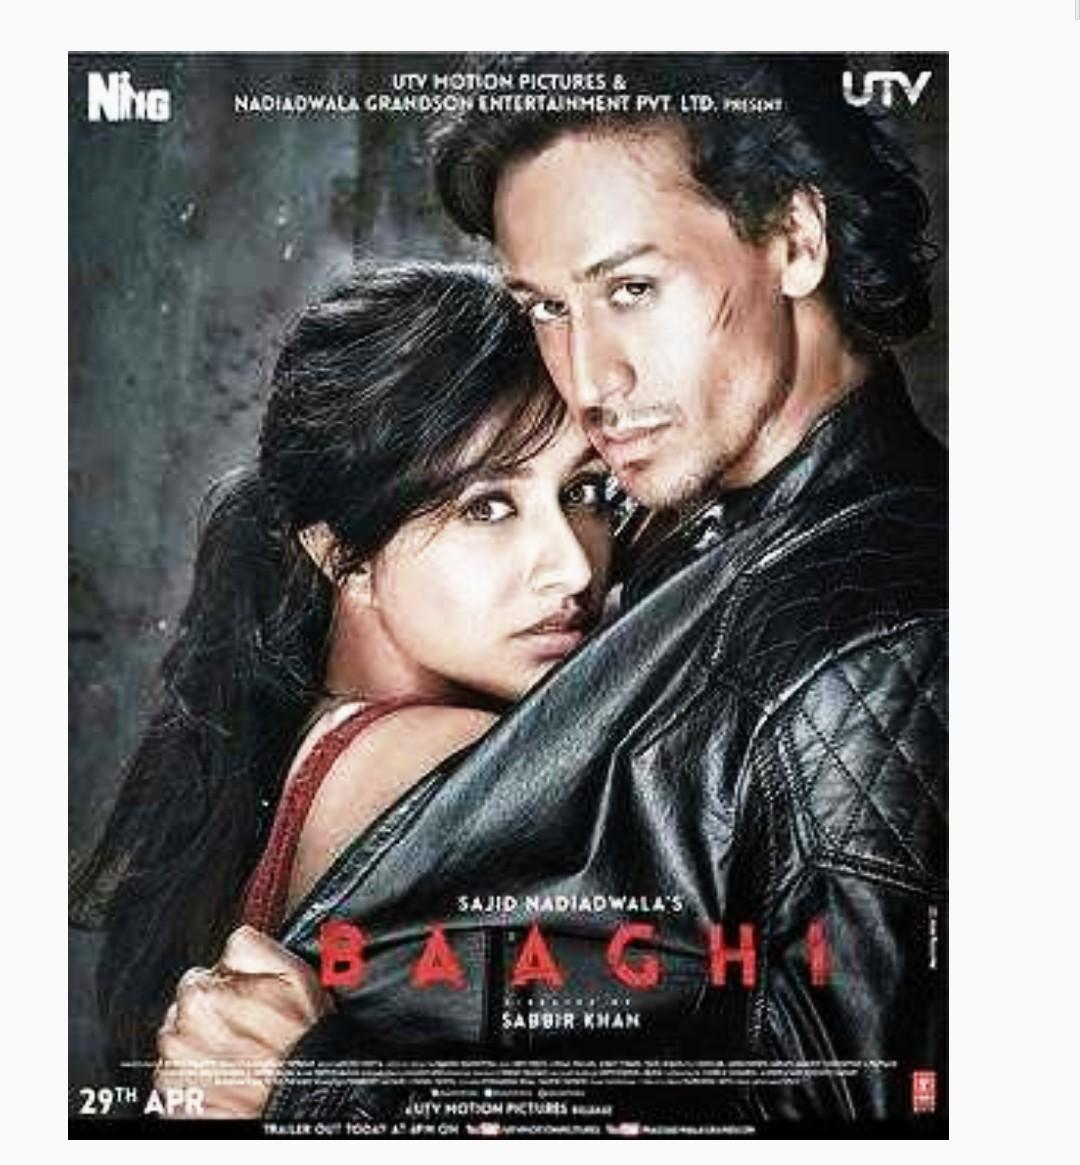 Girl I Need You Song Lyrics Download Mp3 Baaghi Arijite Singh